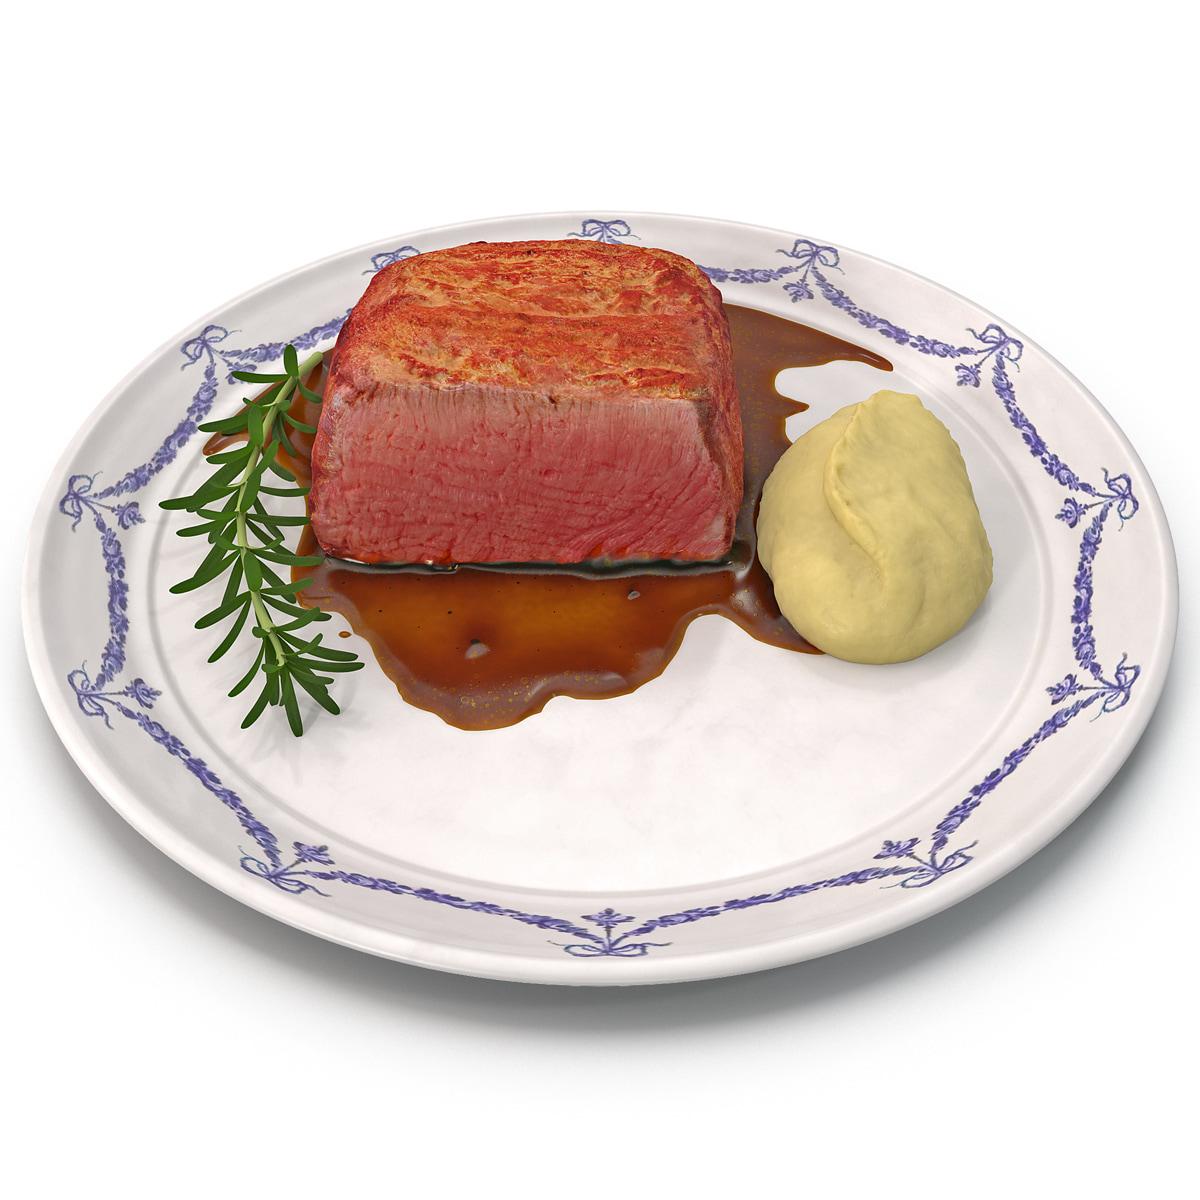 max meal filet mignon